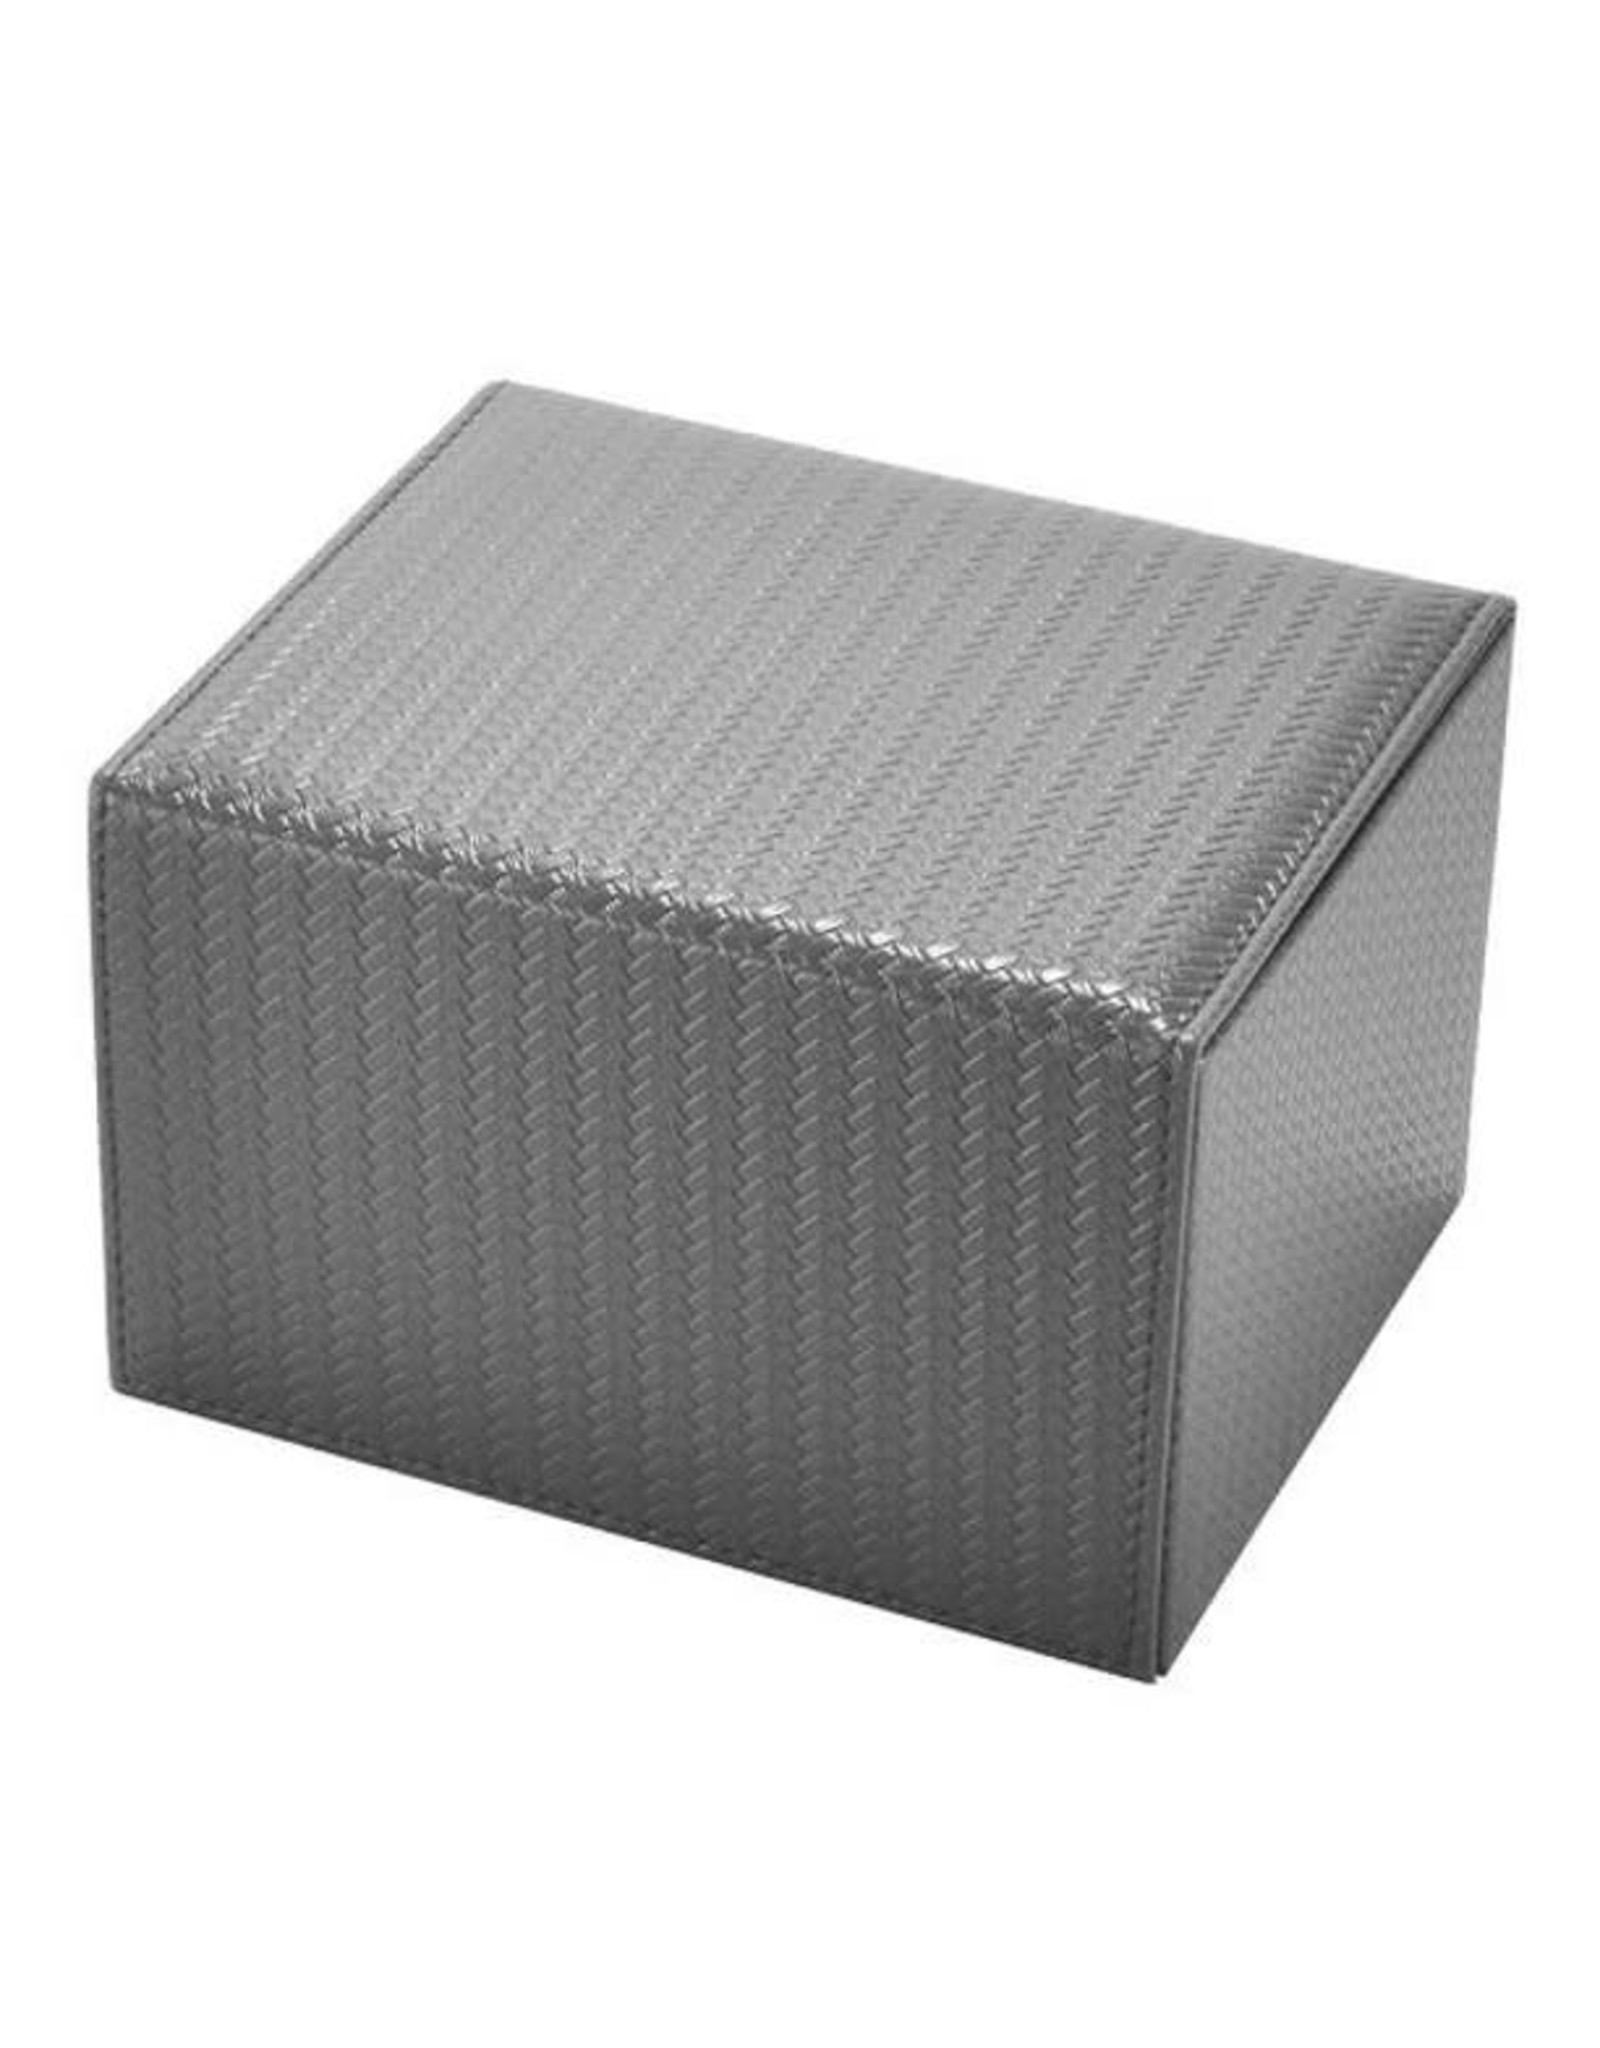 Dex Protection Dex Proline Large Gray 100ct